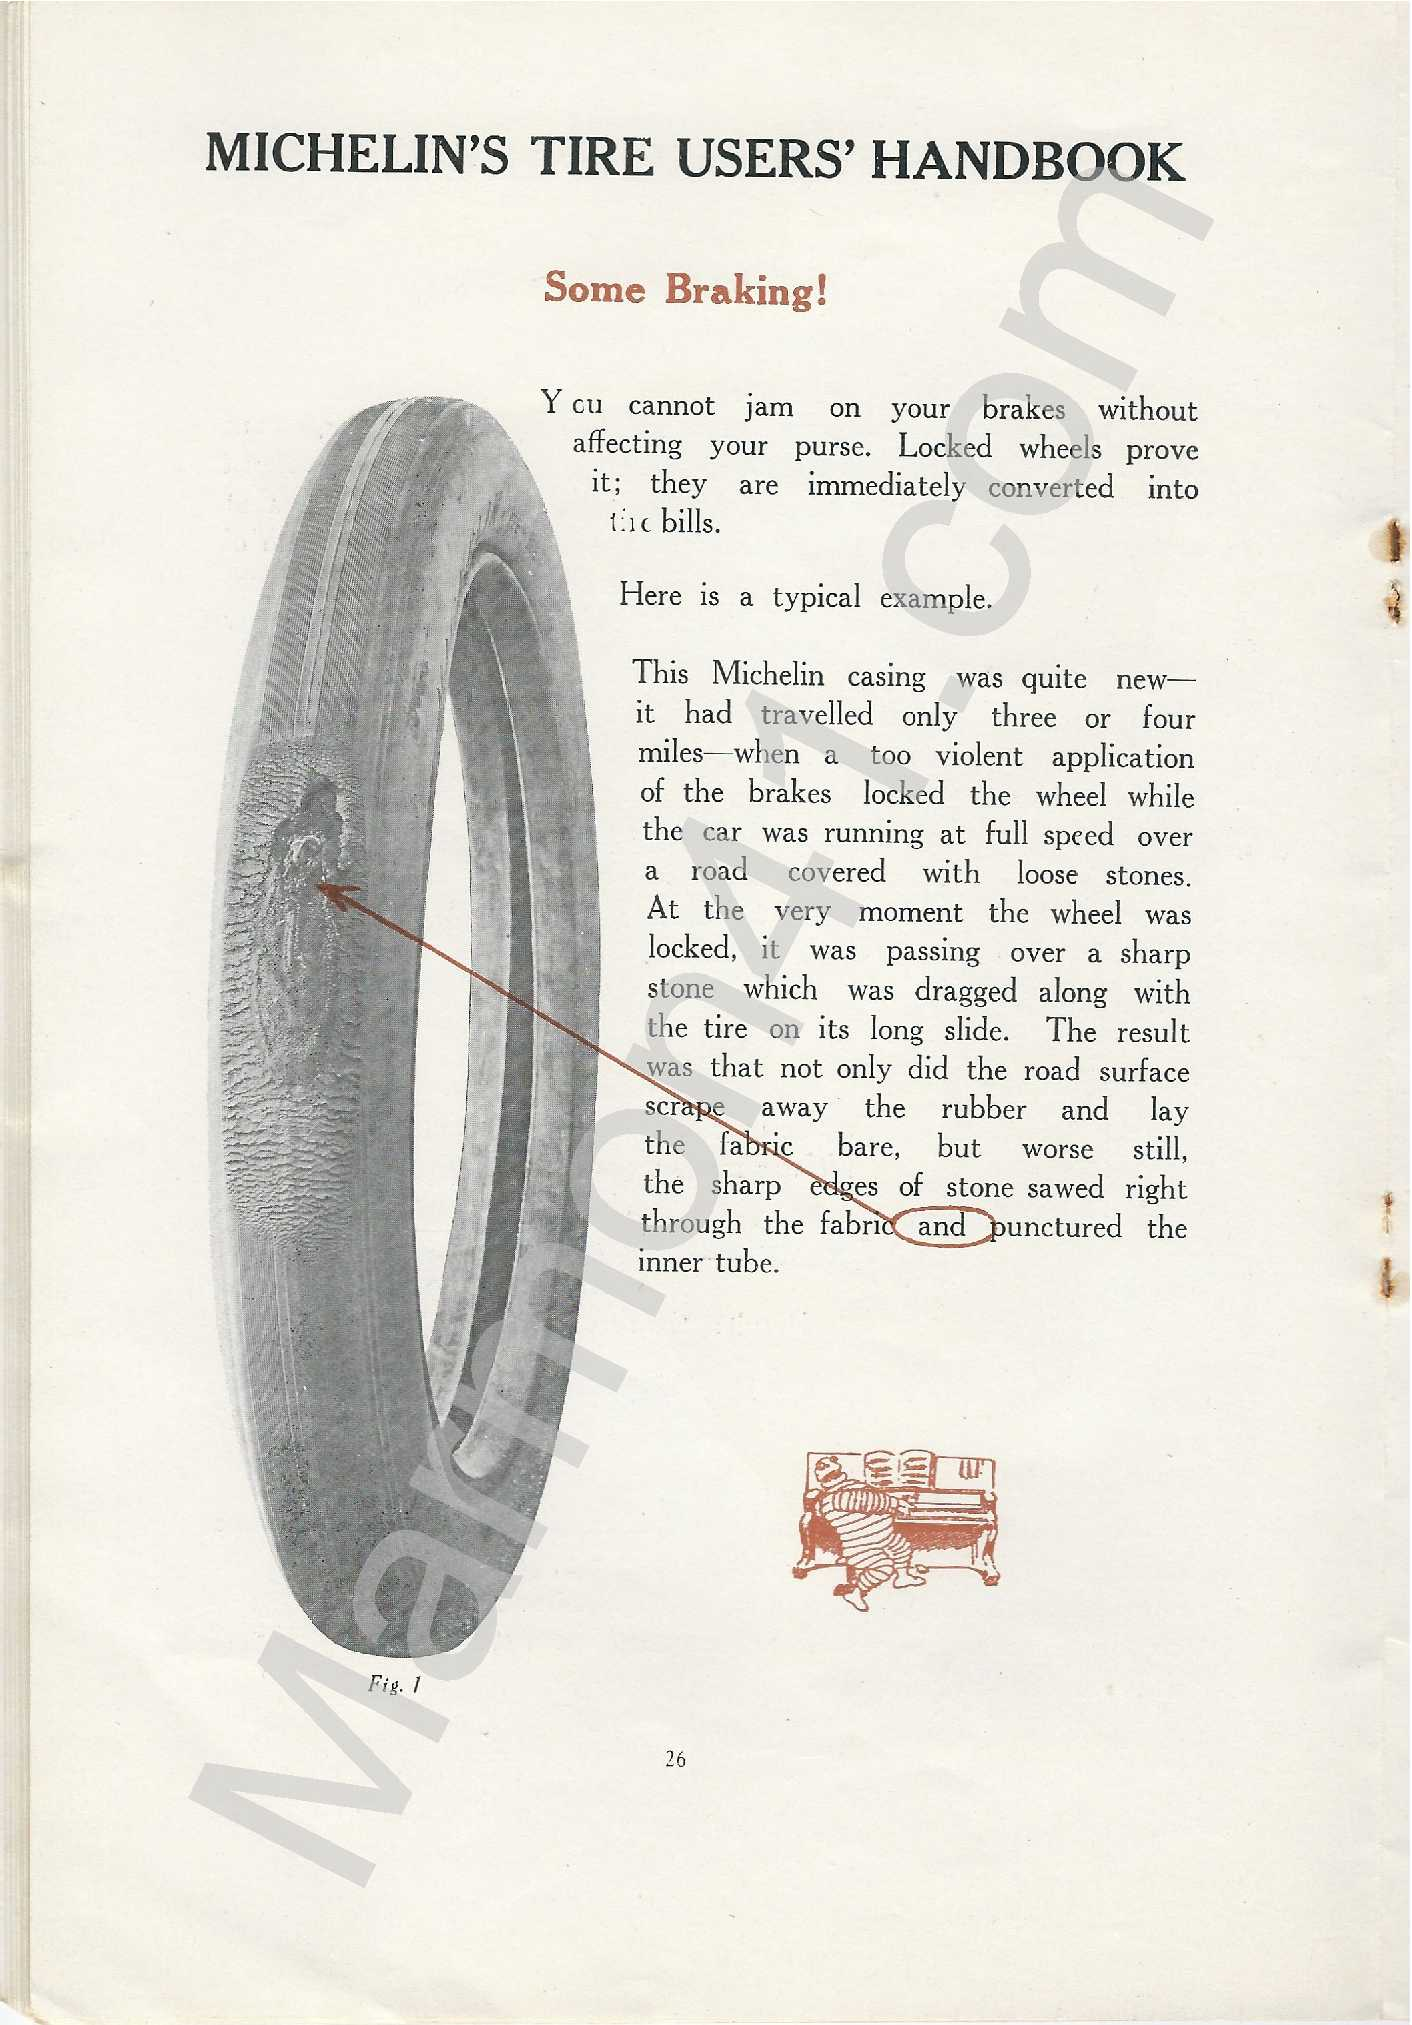 Michelins Tire Users Handbook_27